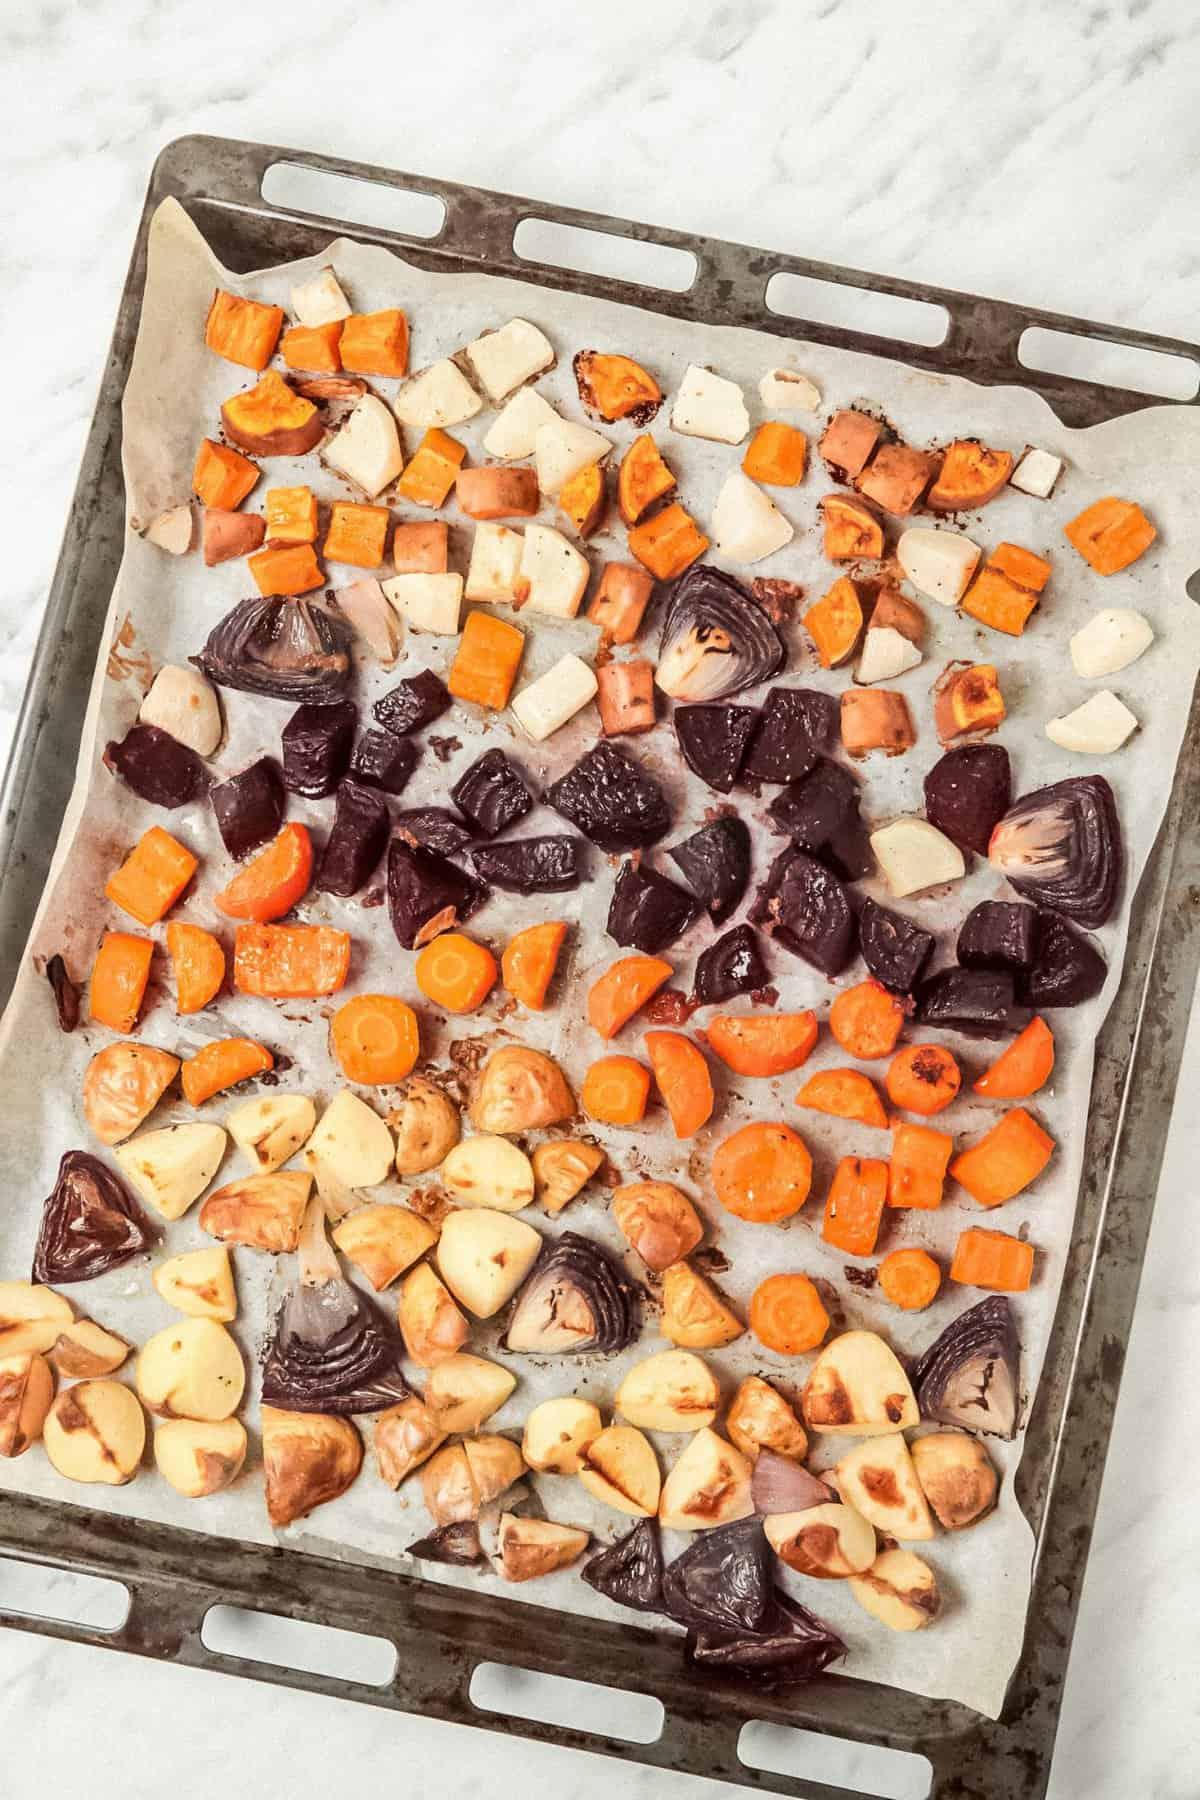 Roasted Root Vegetables on Sheet Pan